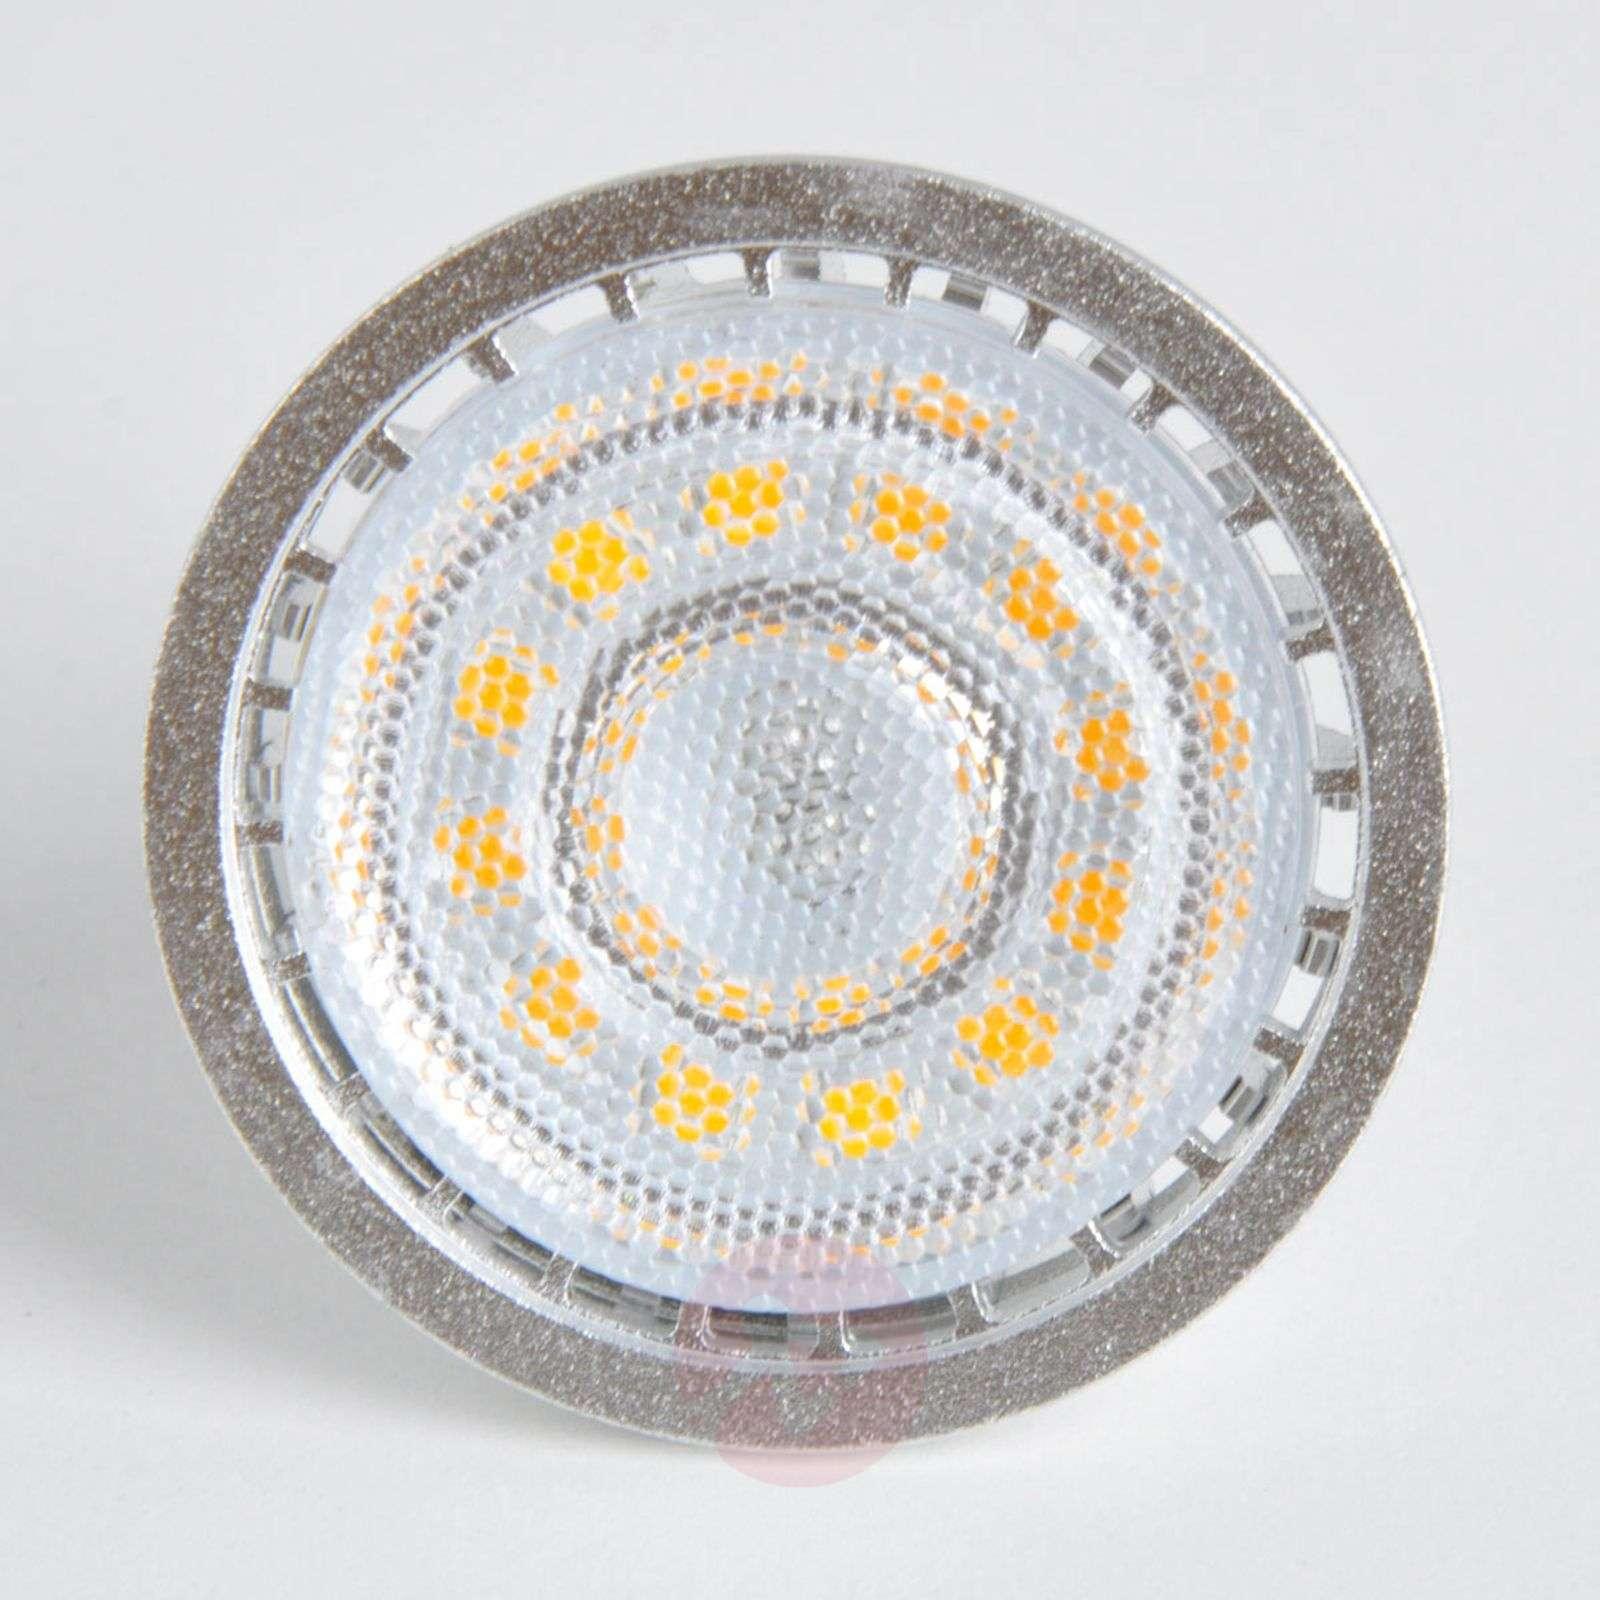 GU10 5 W 830 LED-heijastinlamppu 55degree-9639040-01